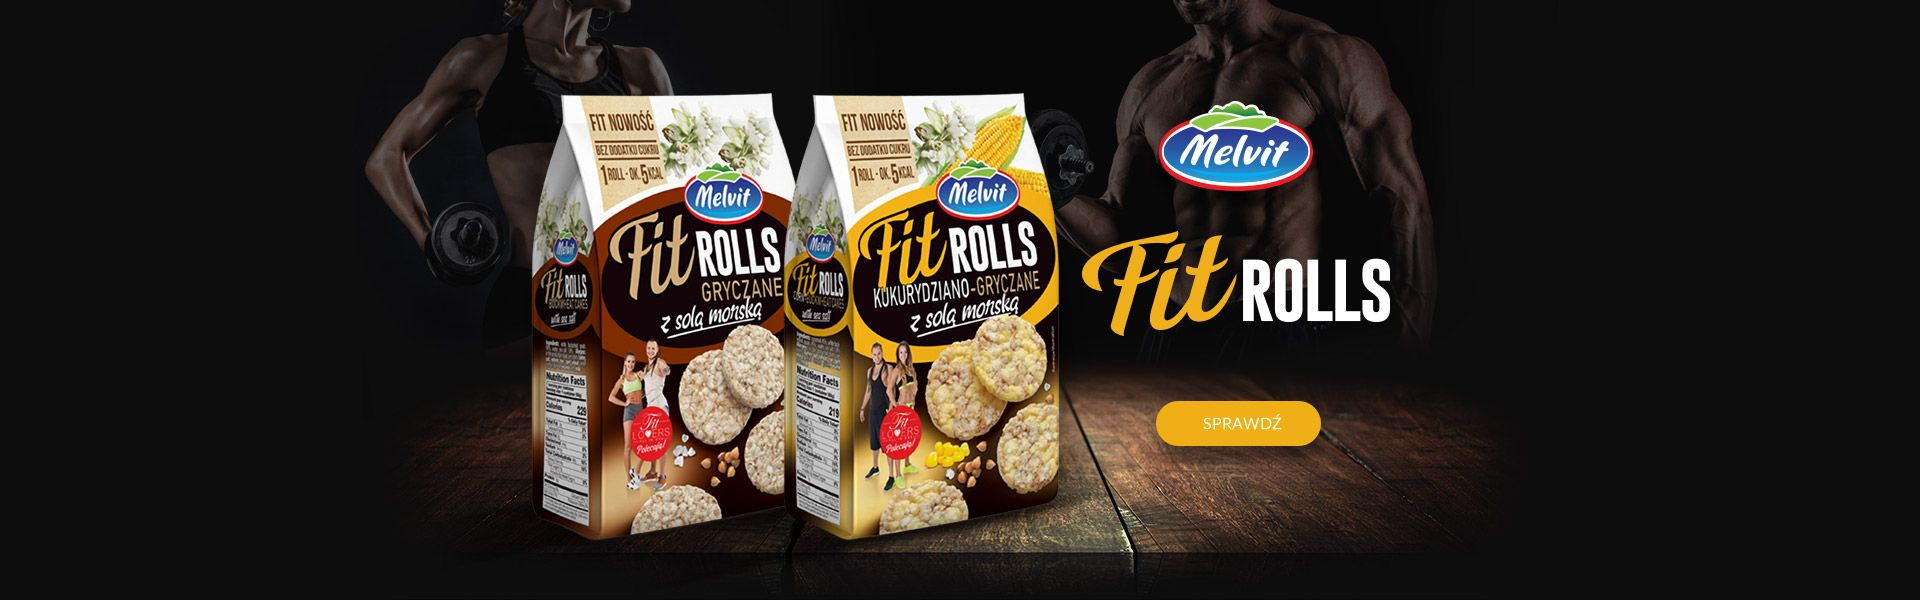 Melvit Fit Rolls